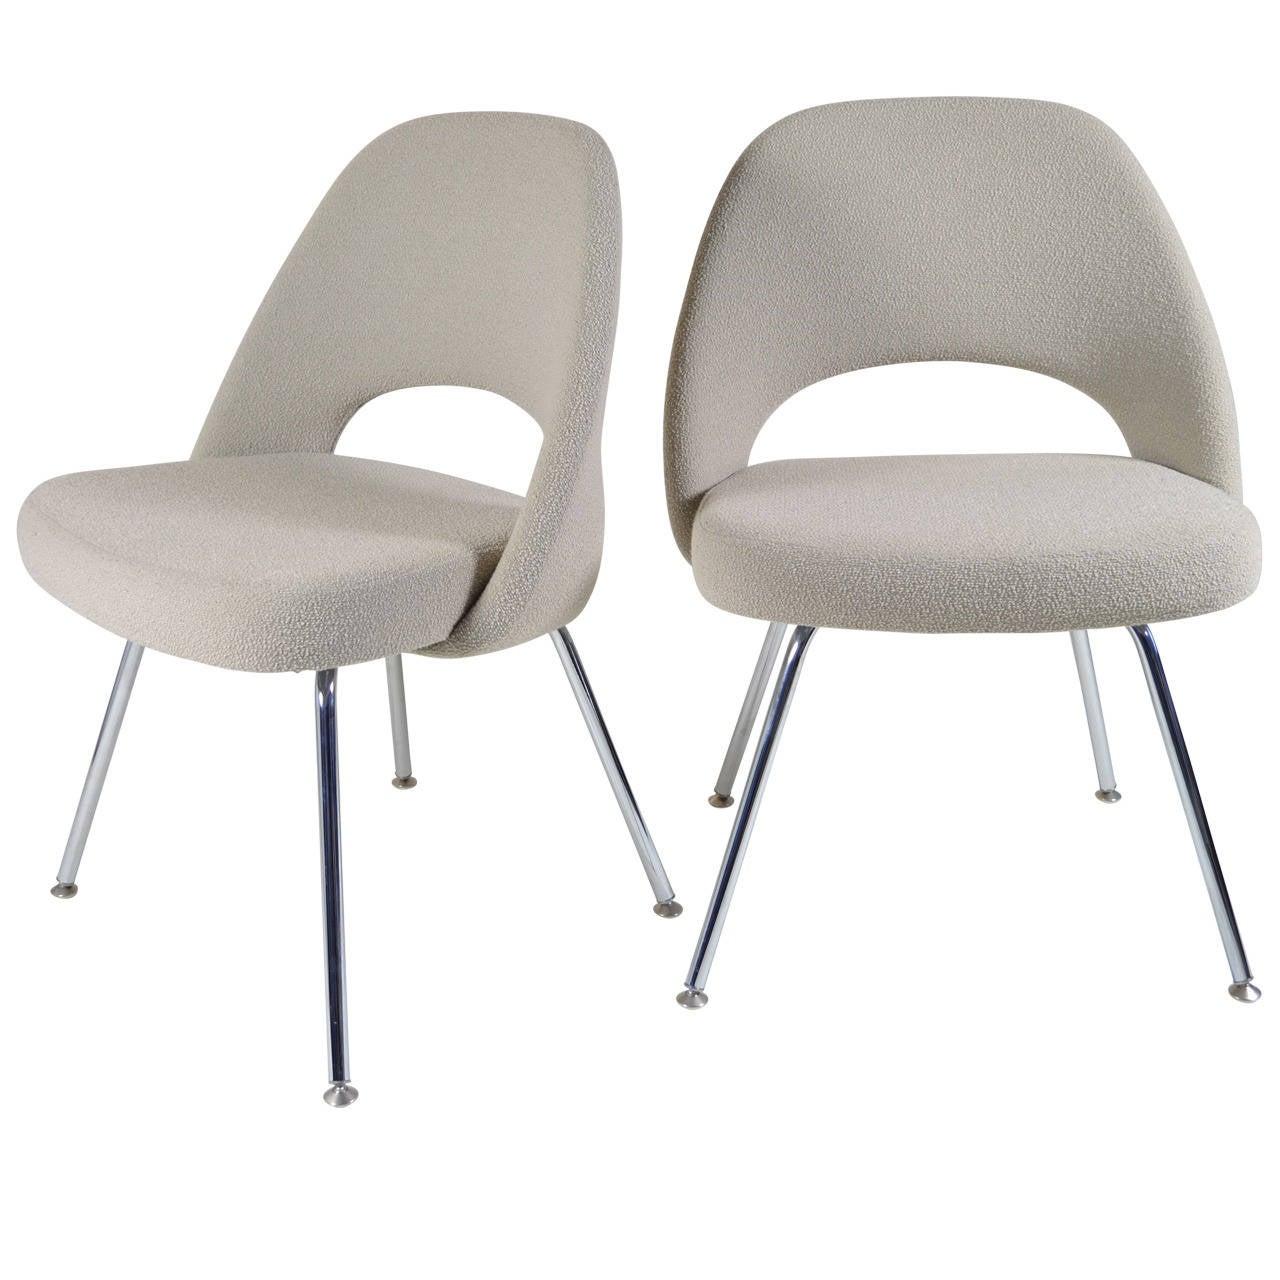 Pair saarinen executive armless chairs at 1stdibs for Saarinen executive armless chair